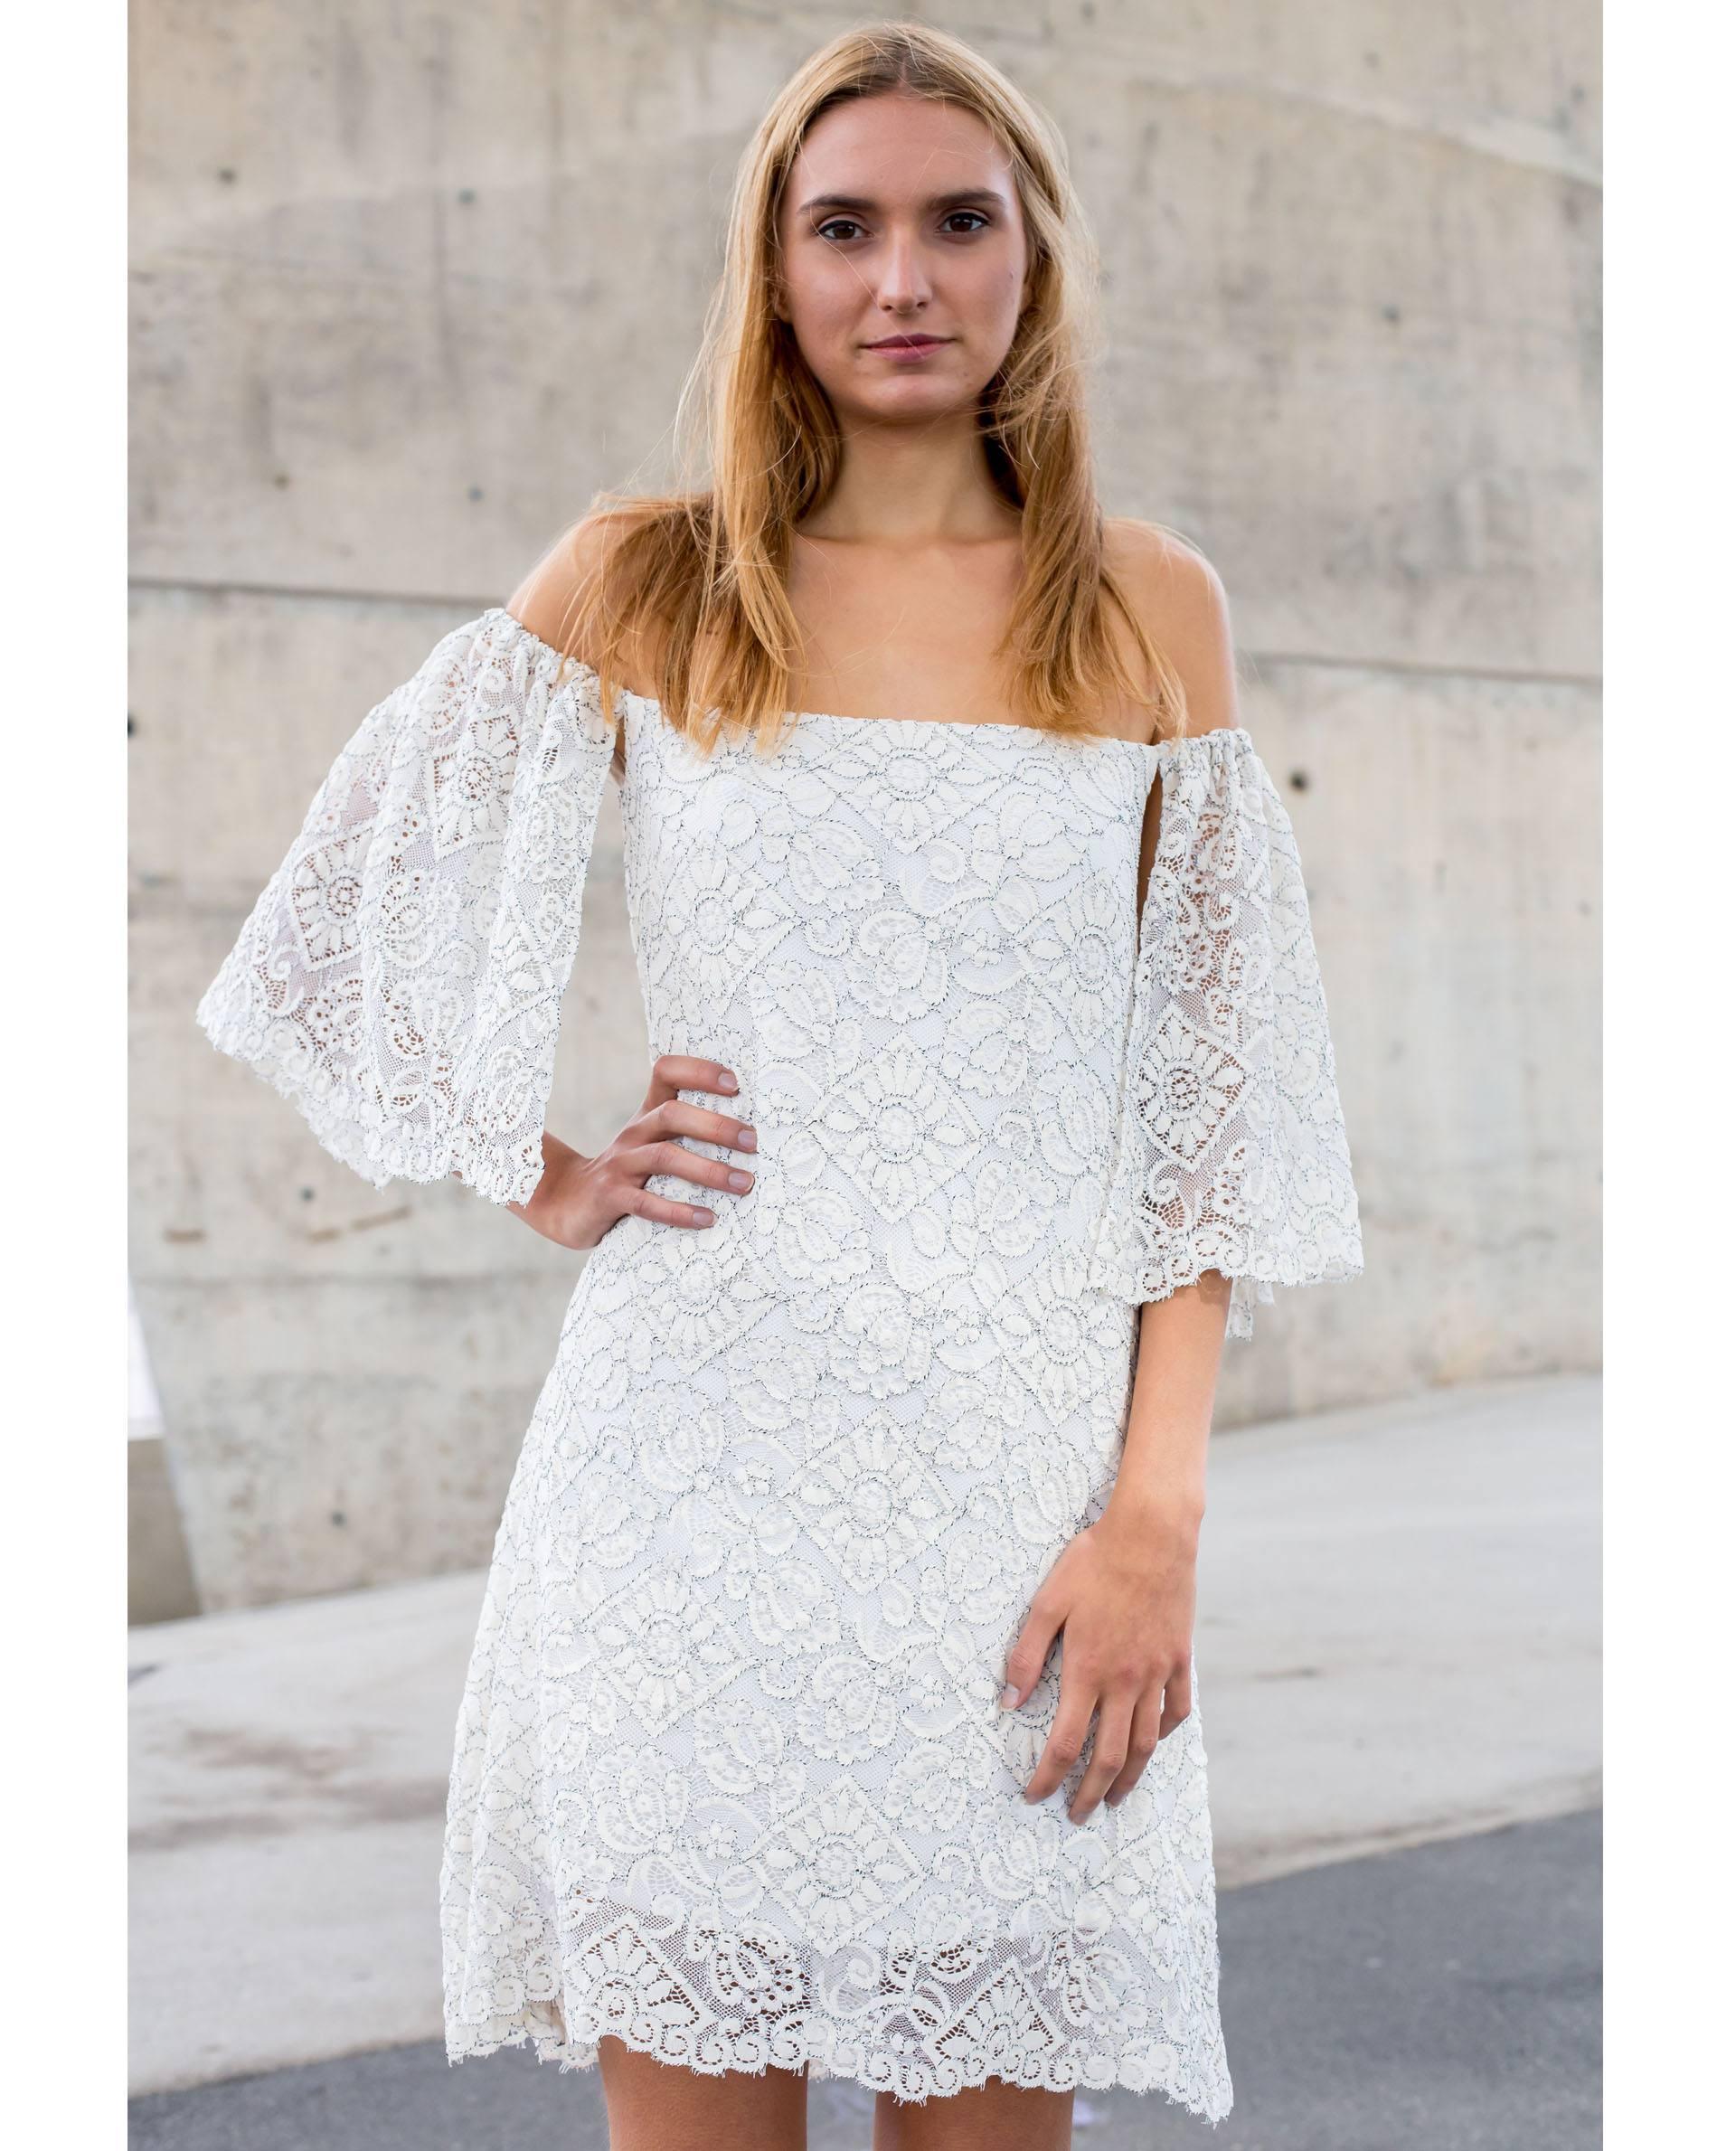 PRÊT À PORTER-SPRING/SUMMER 2018 - VESTIDOS - Vestido mini de encaje blanco